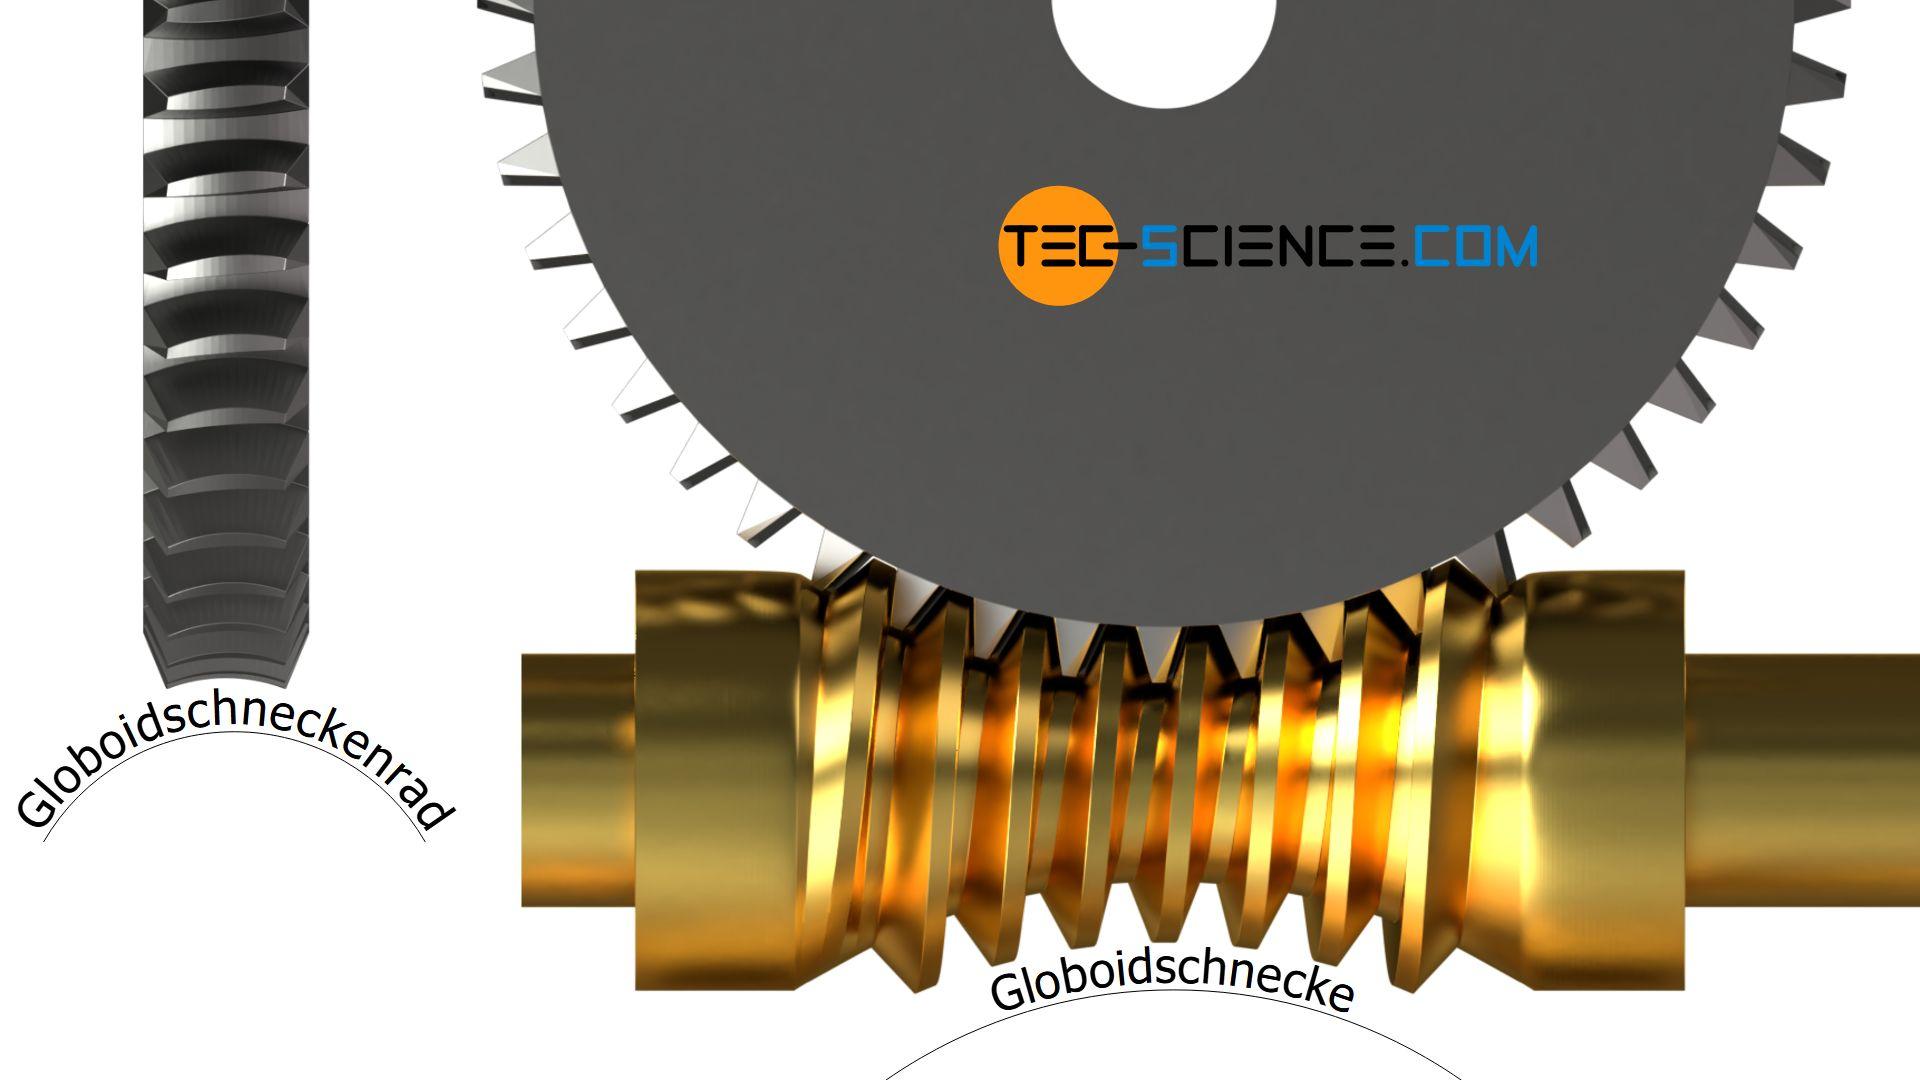 Globoidschnecke und Globoidschneckenrad (Globoidschneckengetriebe)